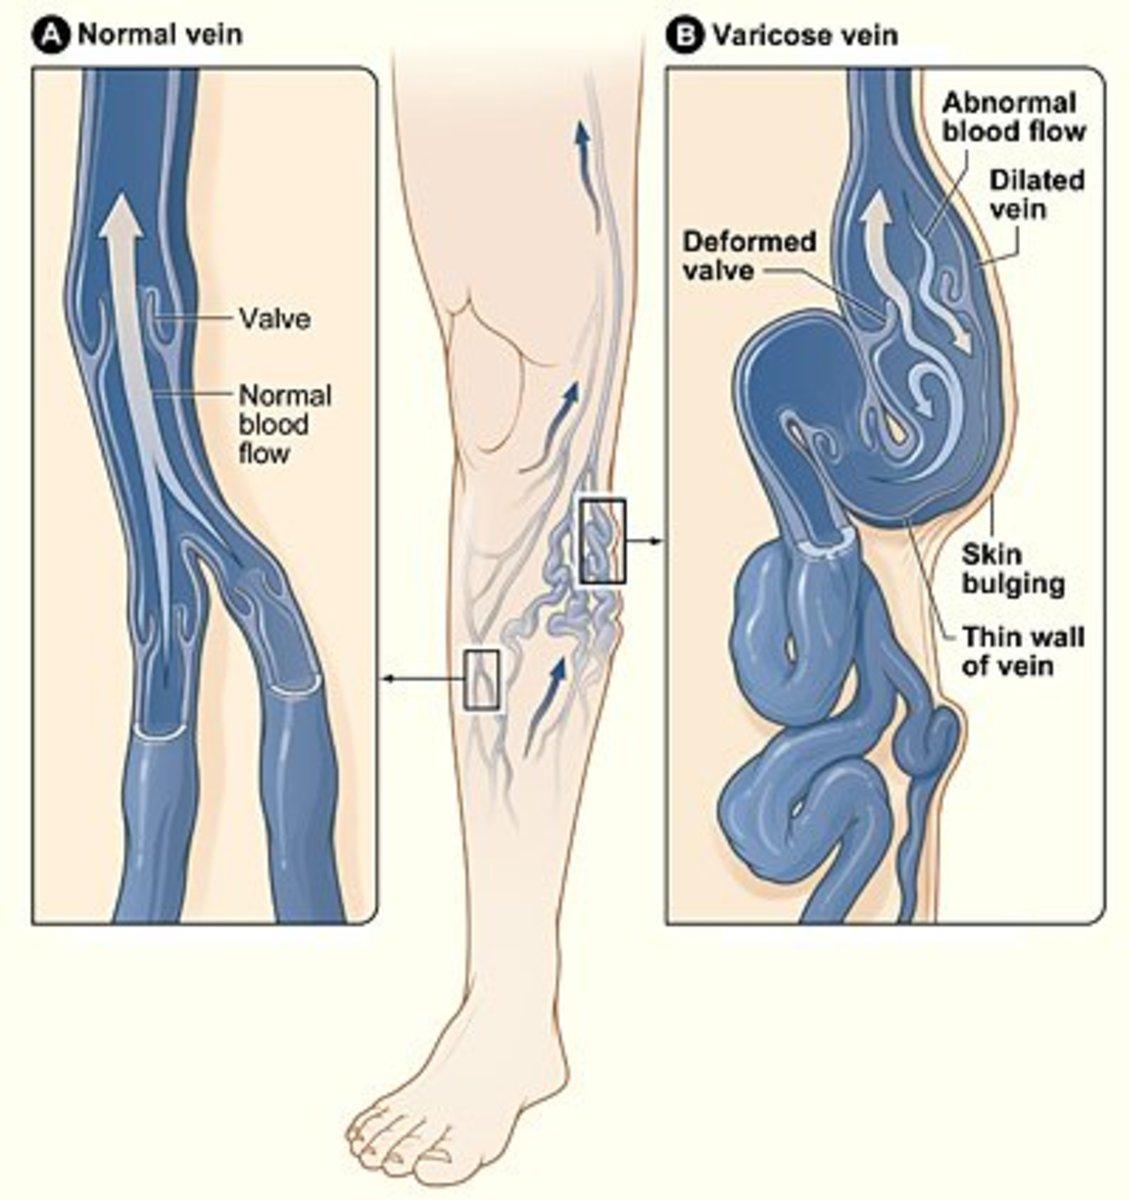 apple-cider-varicose-veins